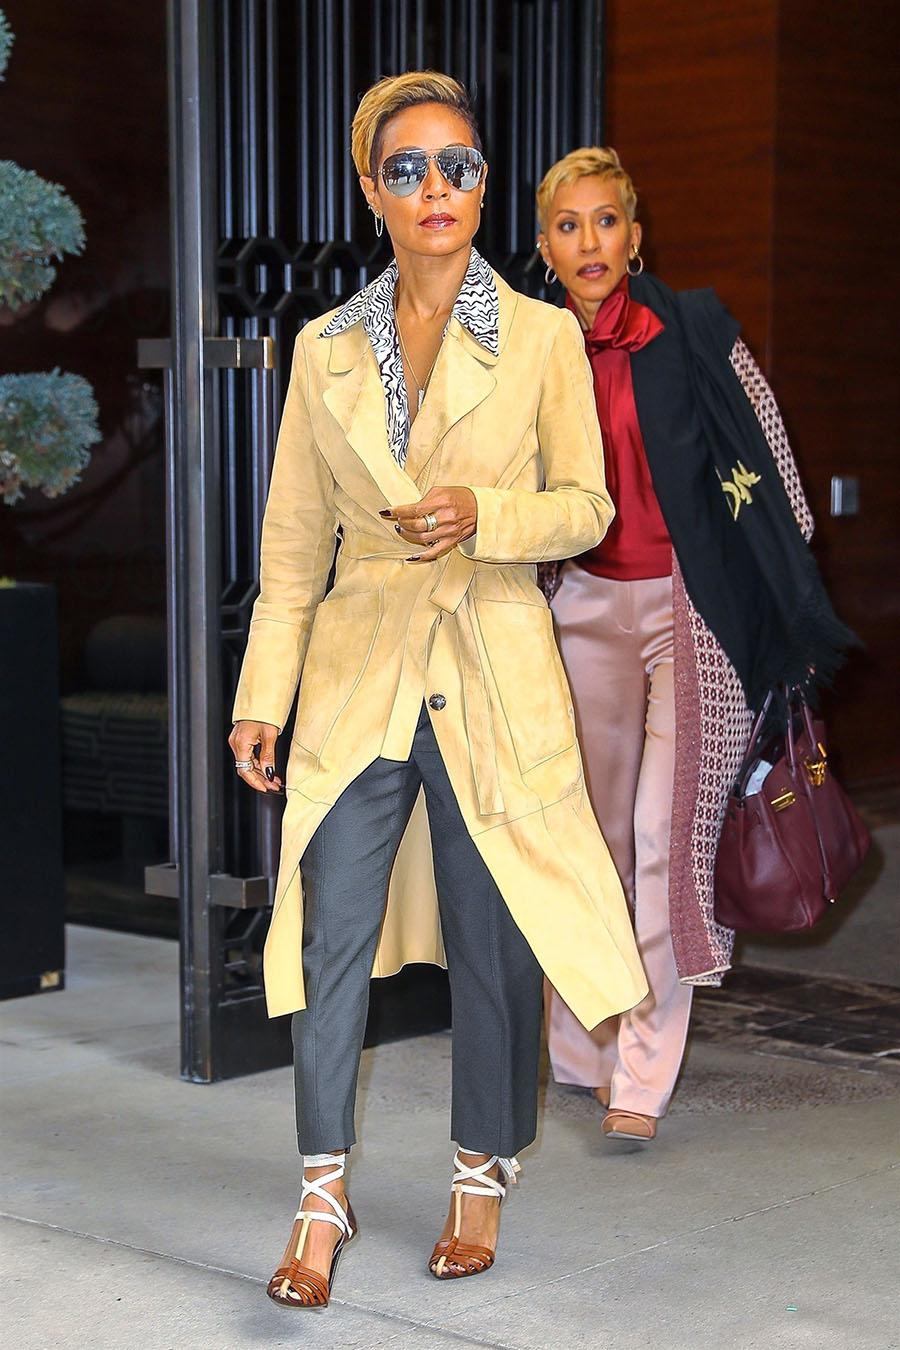 Jada Pinkett Smith And Her Mom Adrienne Banfield Jones